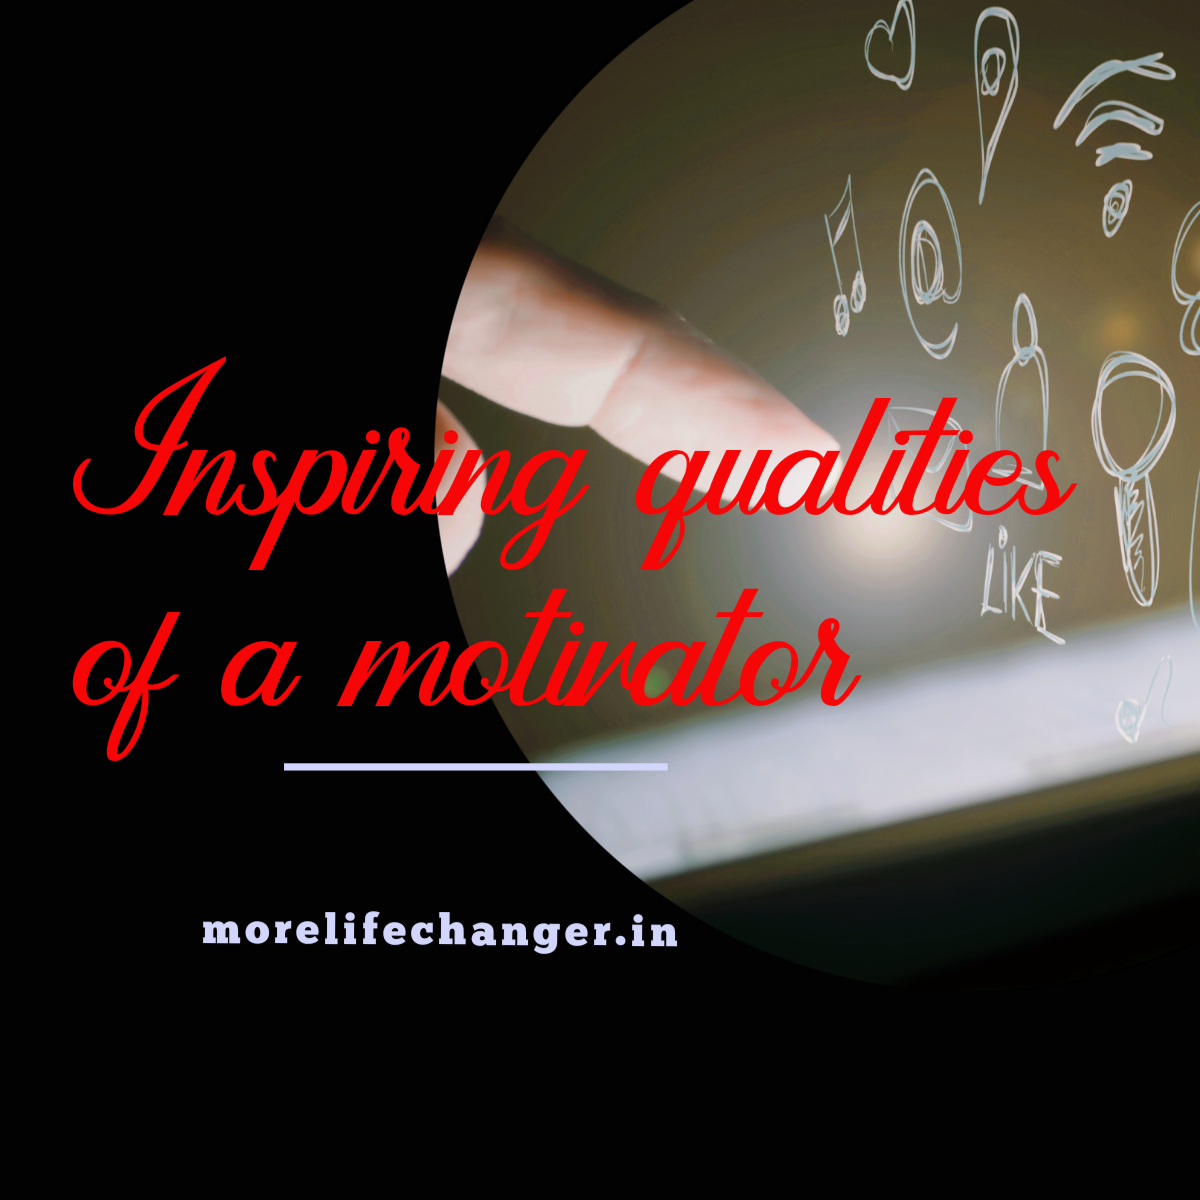 Inspiring qualities of a motivator